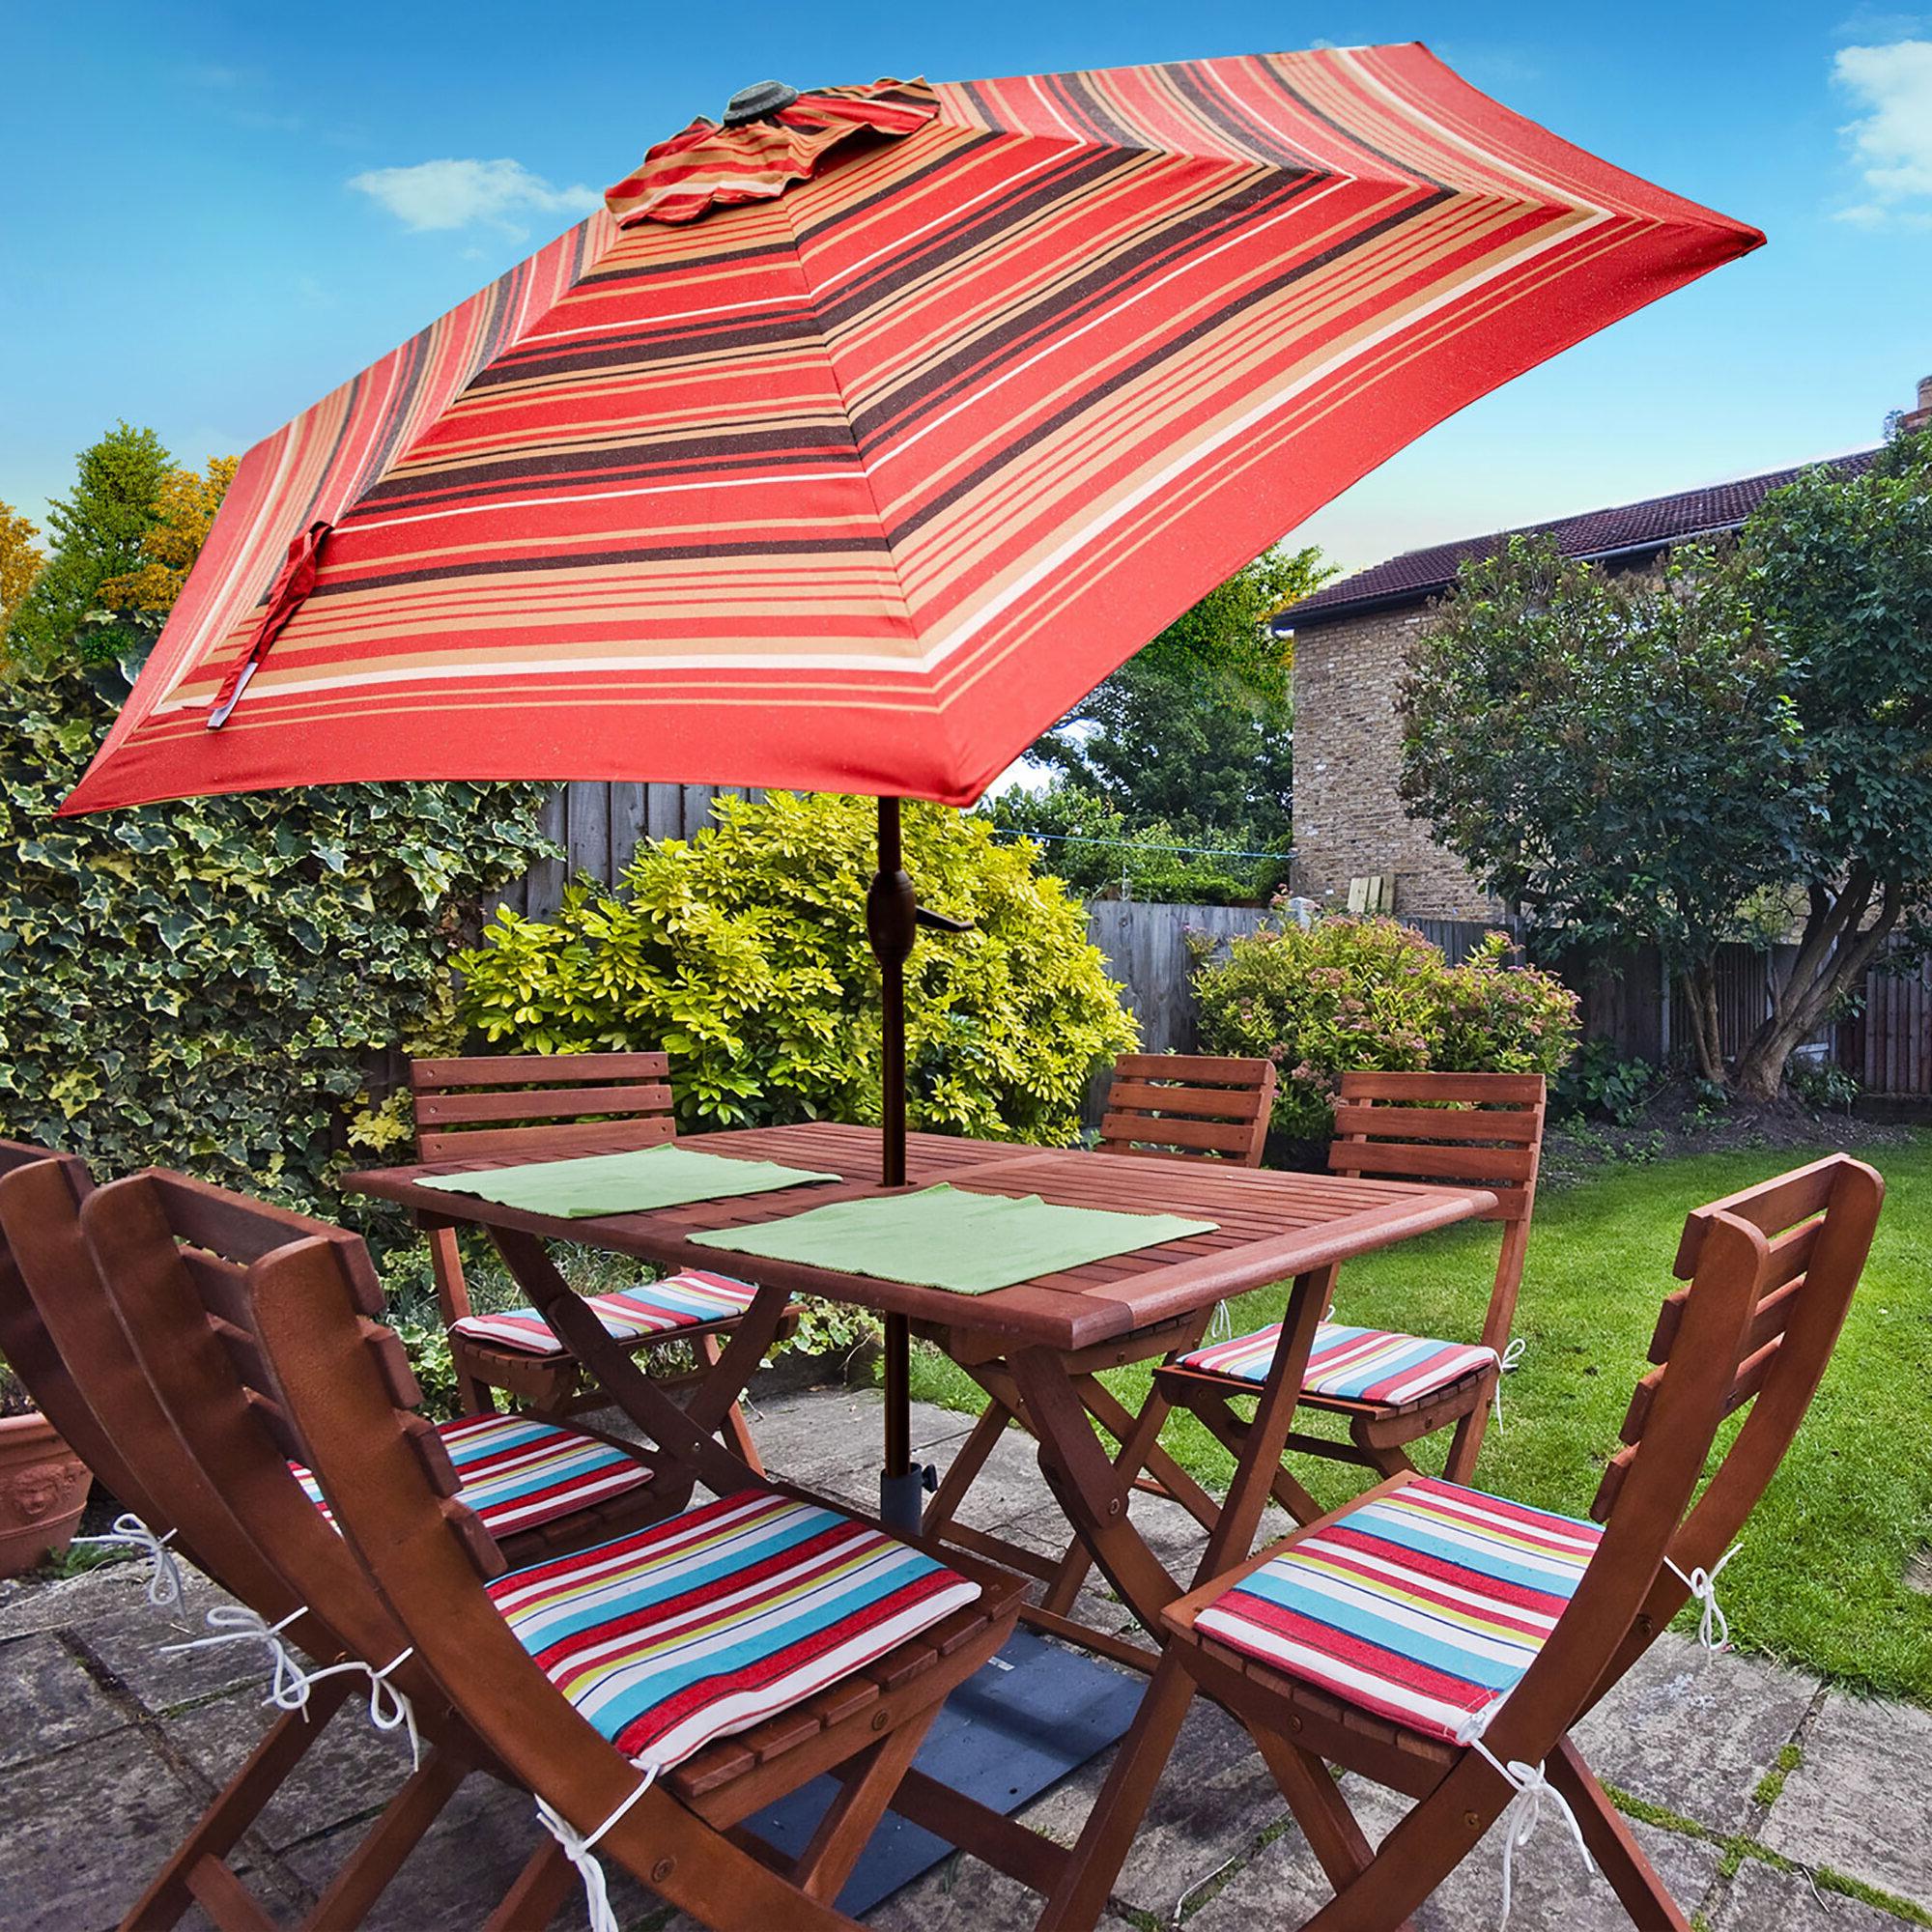 Folkeste 9' Market Umbrella Regarding Well Liked Fleetwood Market Umbrellas (View 3 of 20)